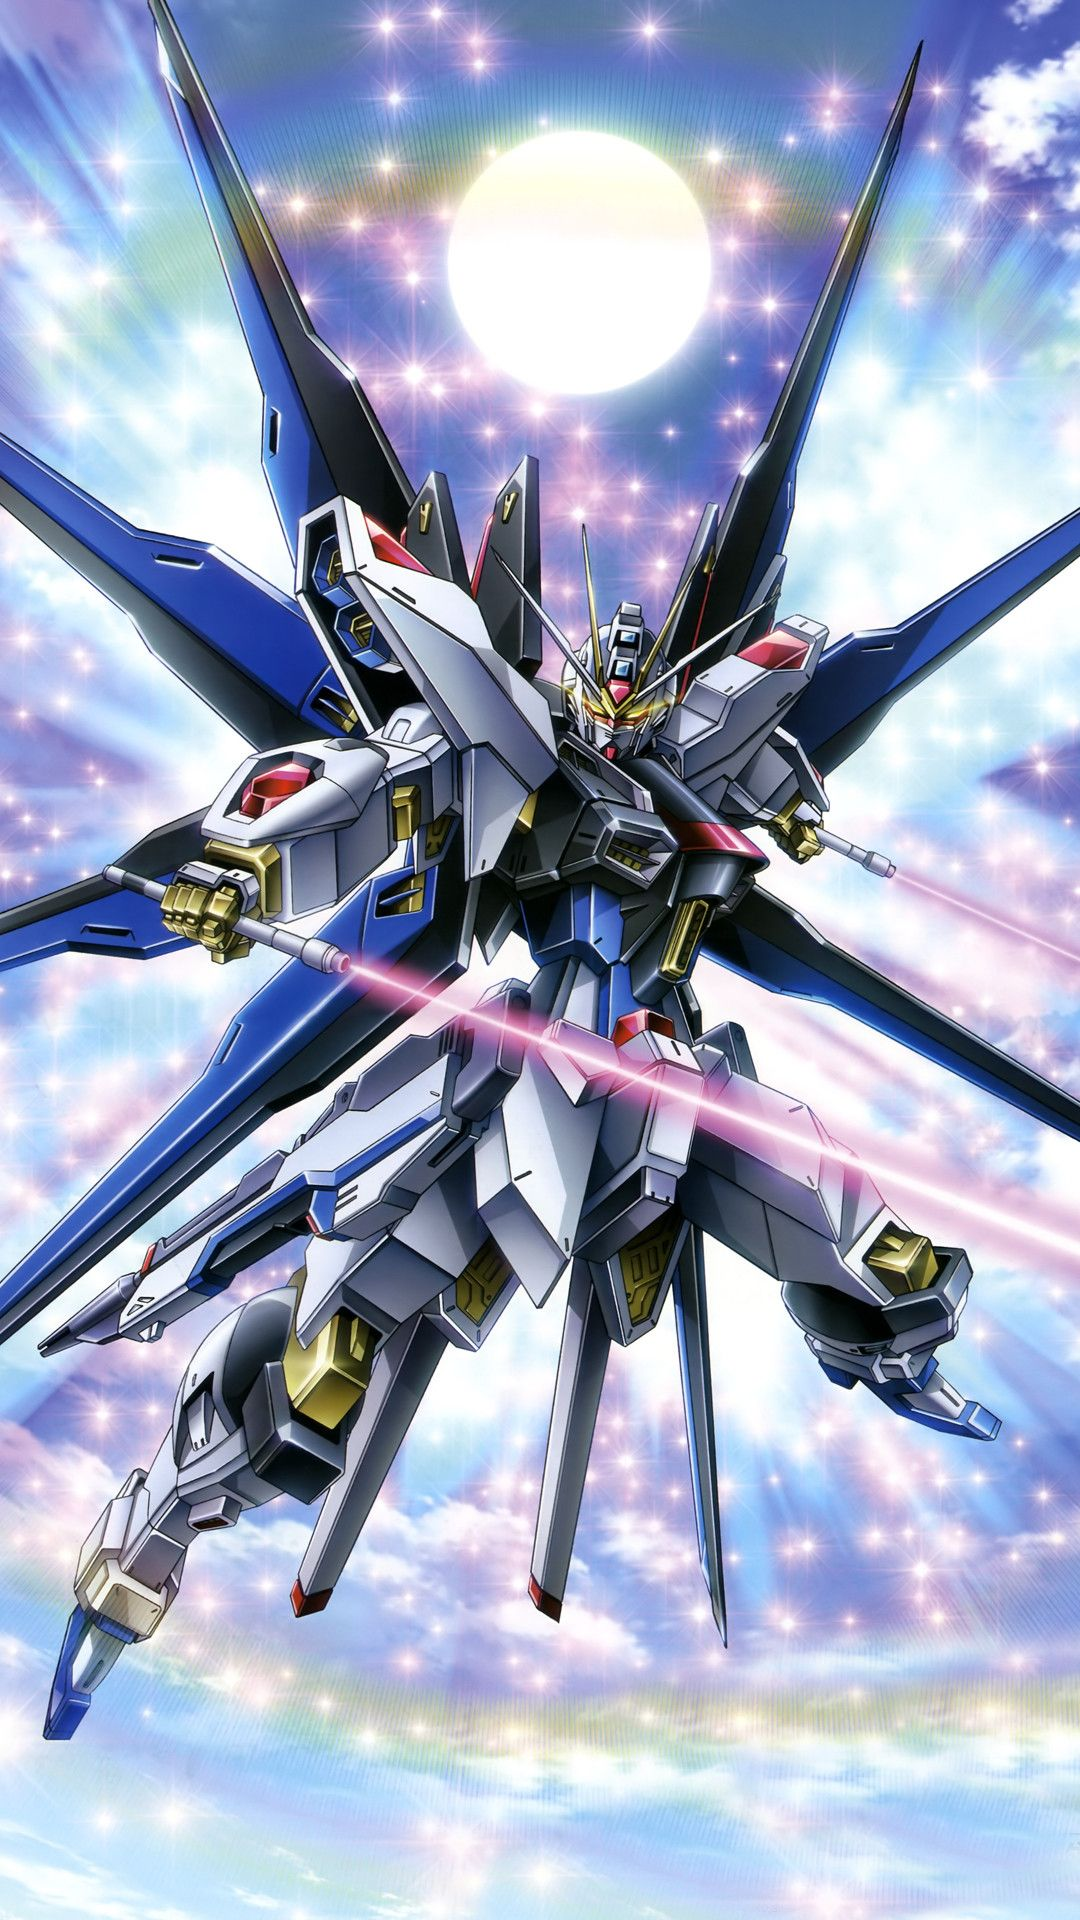 Res 1080x1920, Gundam HD Wallpapers in 2020 Gundam